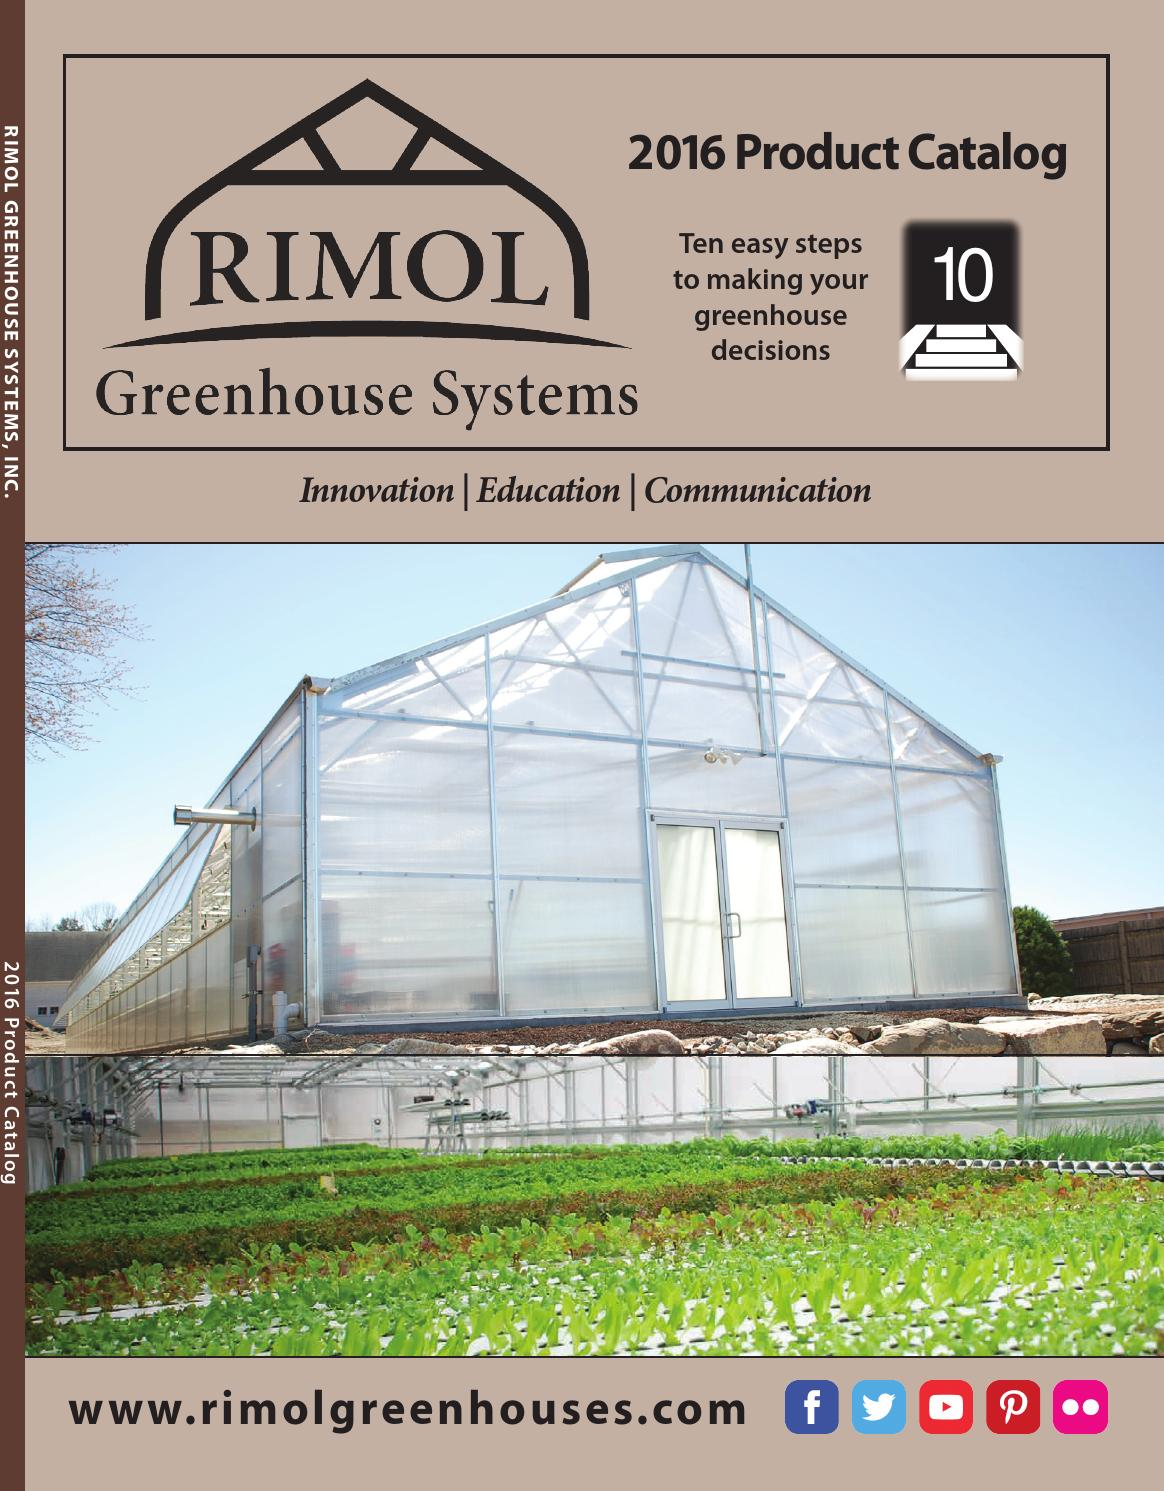 Rimol Greenhouse Catalog 2016 By Altos Issuu